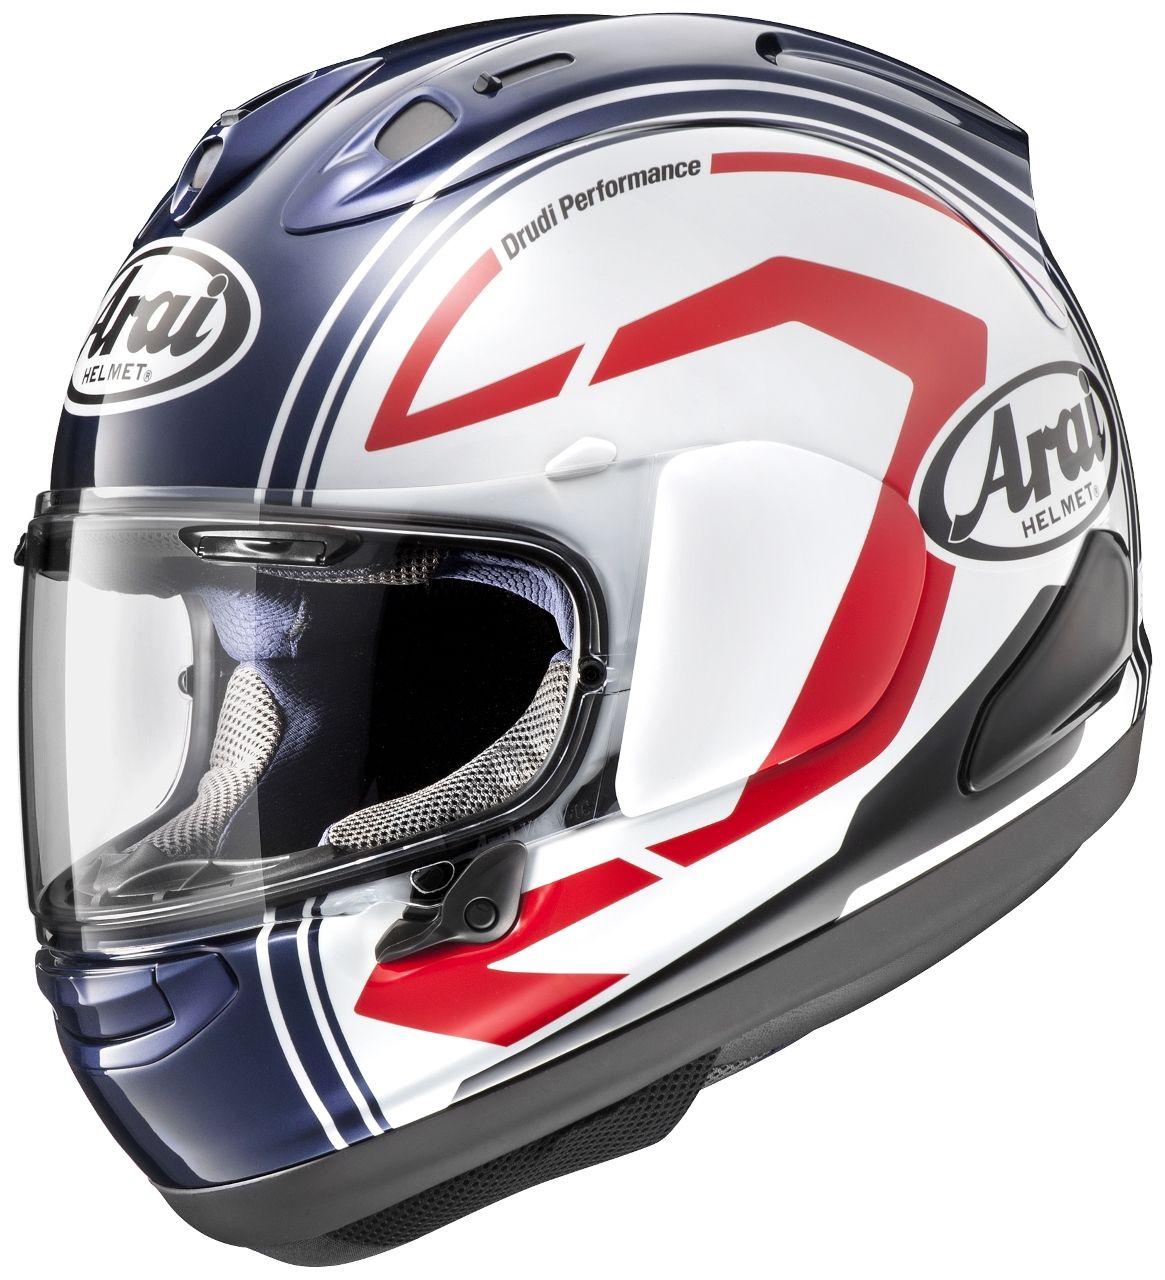 RX-7X STATEMENT 白色 全罩式安全帽